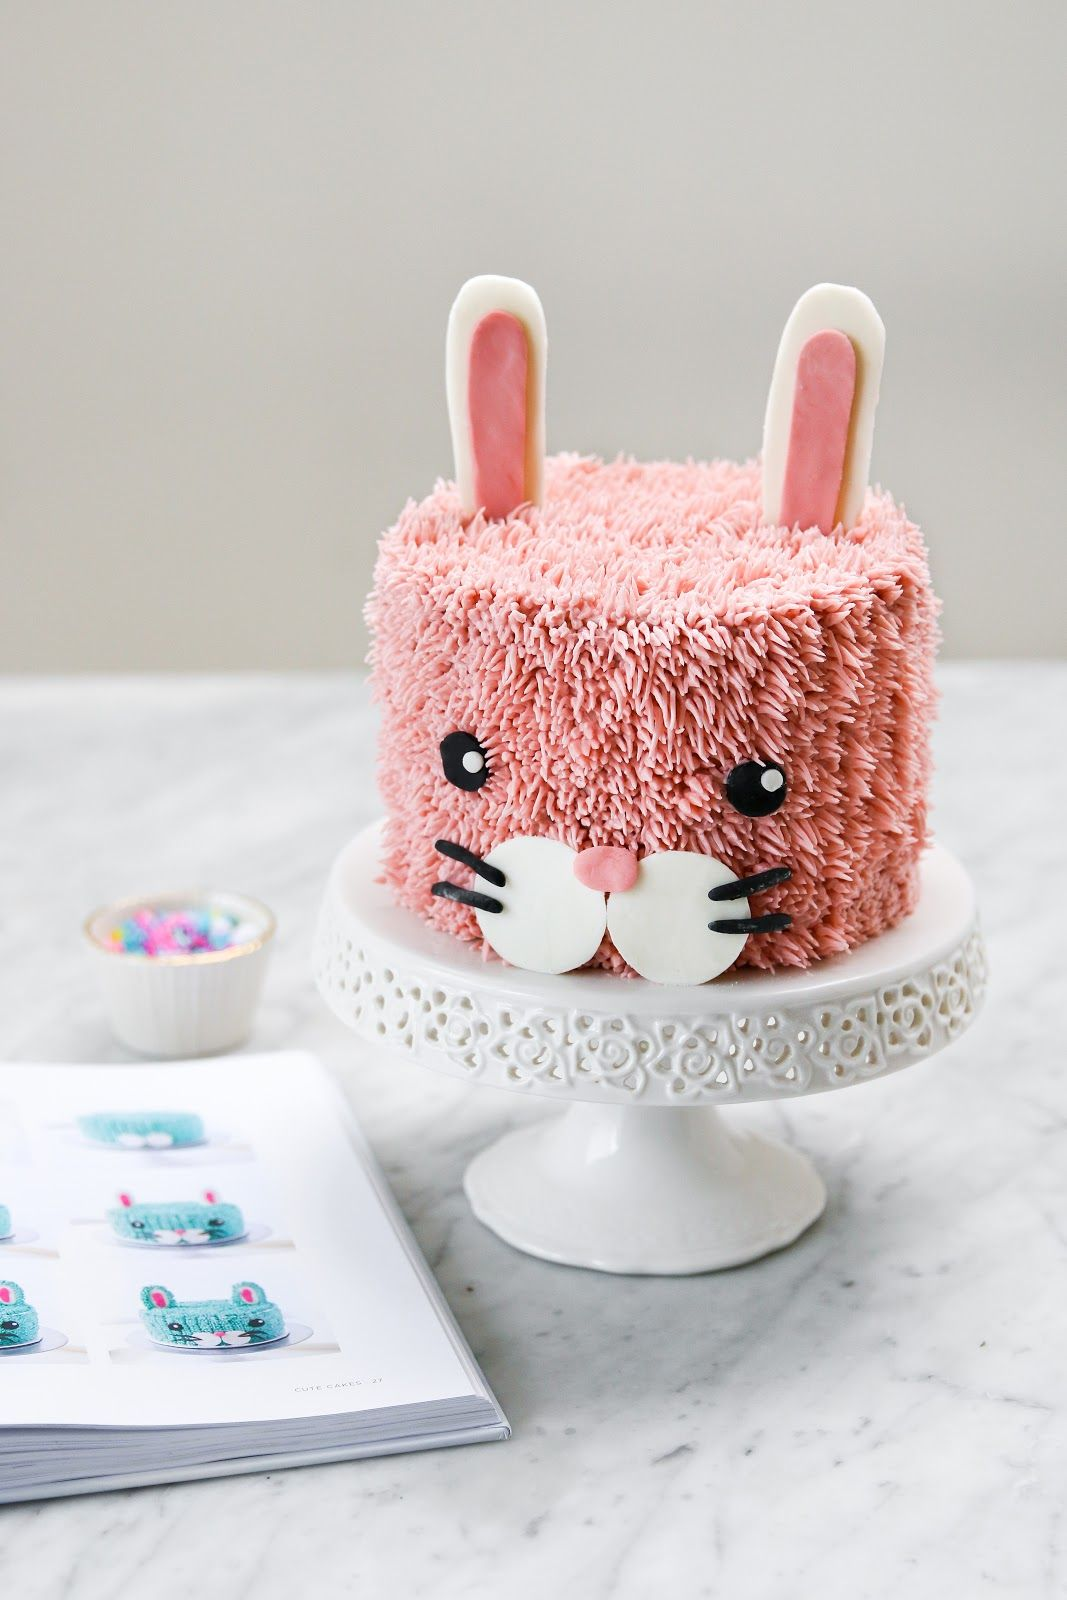 Coco Cake Land S Bunny Cake New Book Constellation Inspiration Recipe Cake Land Cake Bunny Cake